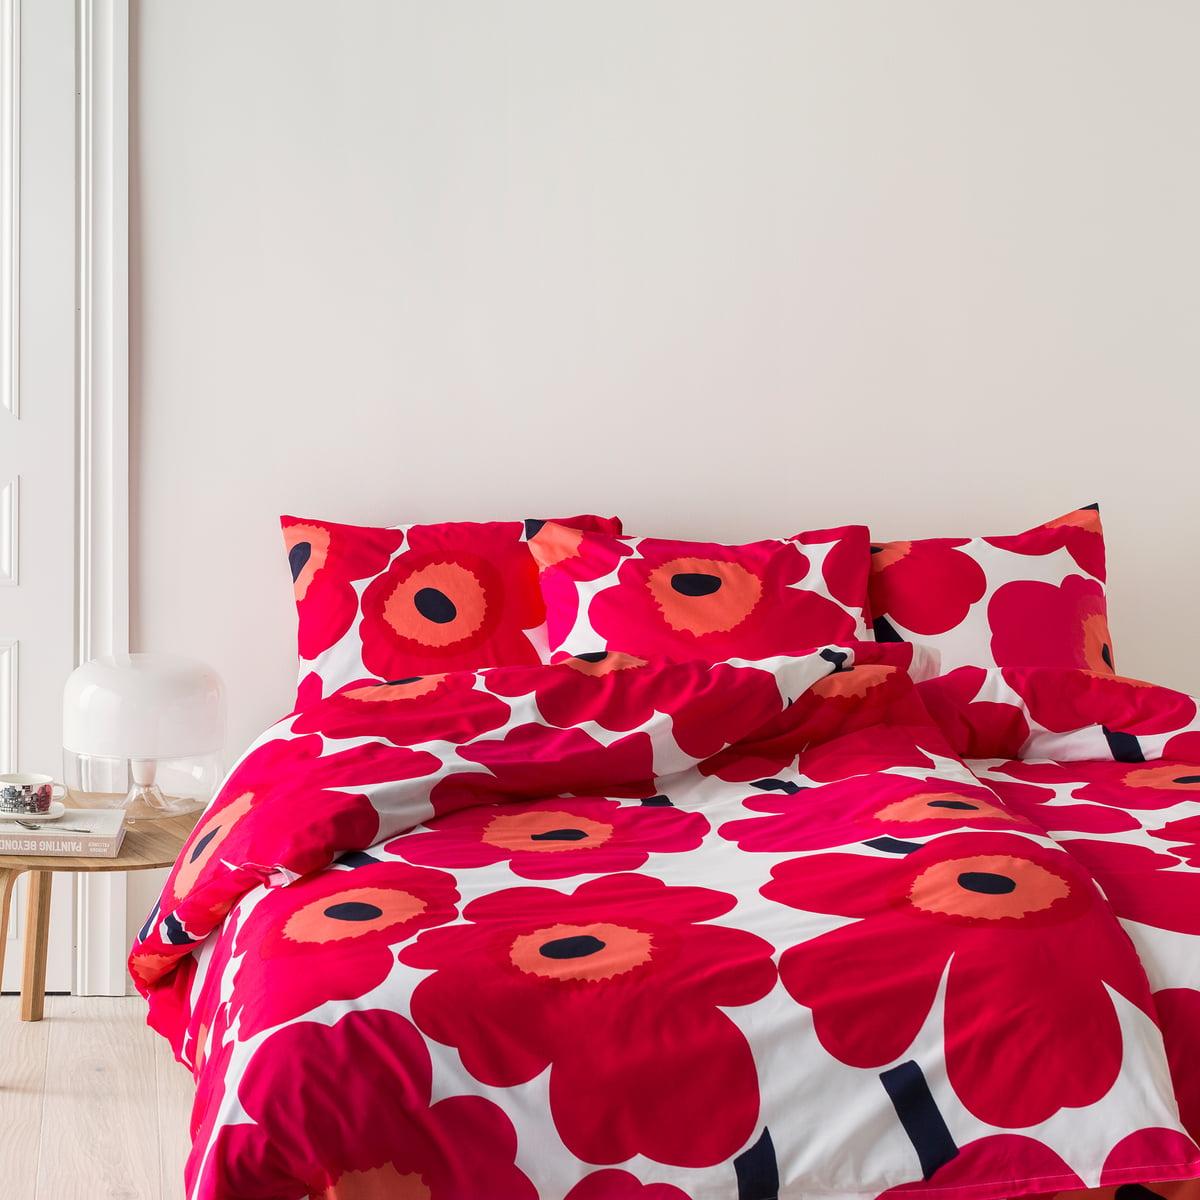 marimekko unikko duevet cover and pillow case with a redwhite florar print